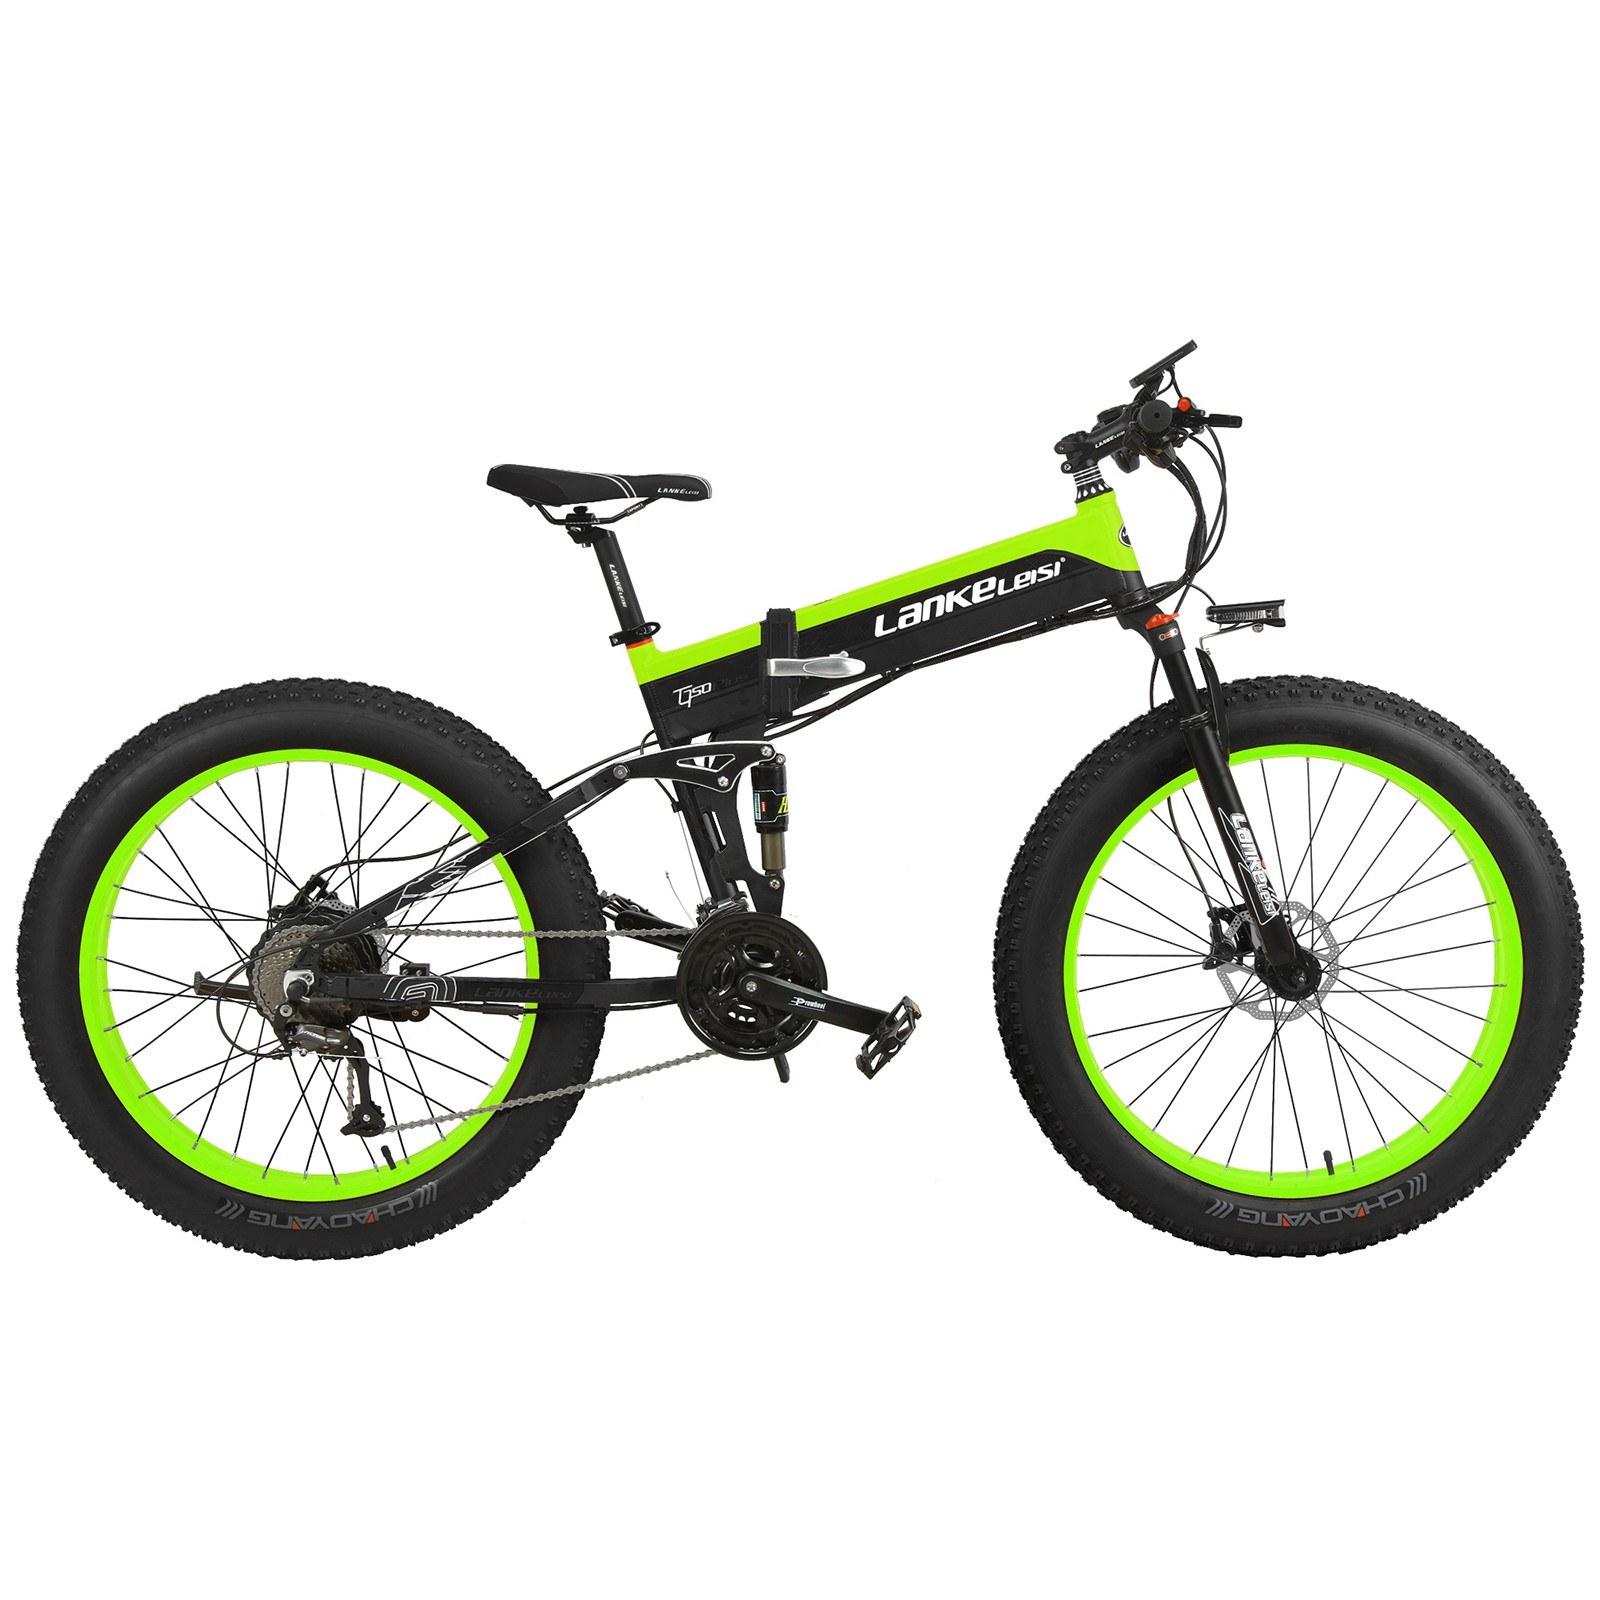 cafago.com - 37% OFF LANKELEISI XT750PLUS 26 Inch Folding Power Assist Electric Bike,free shipping+$1353.13